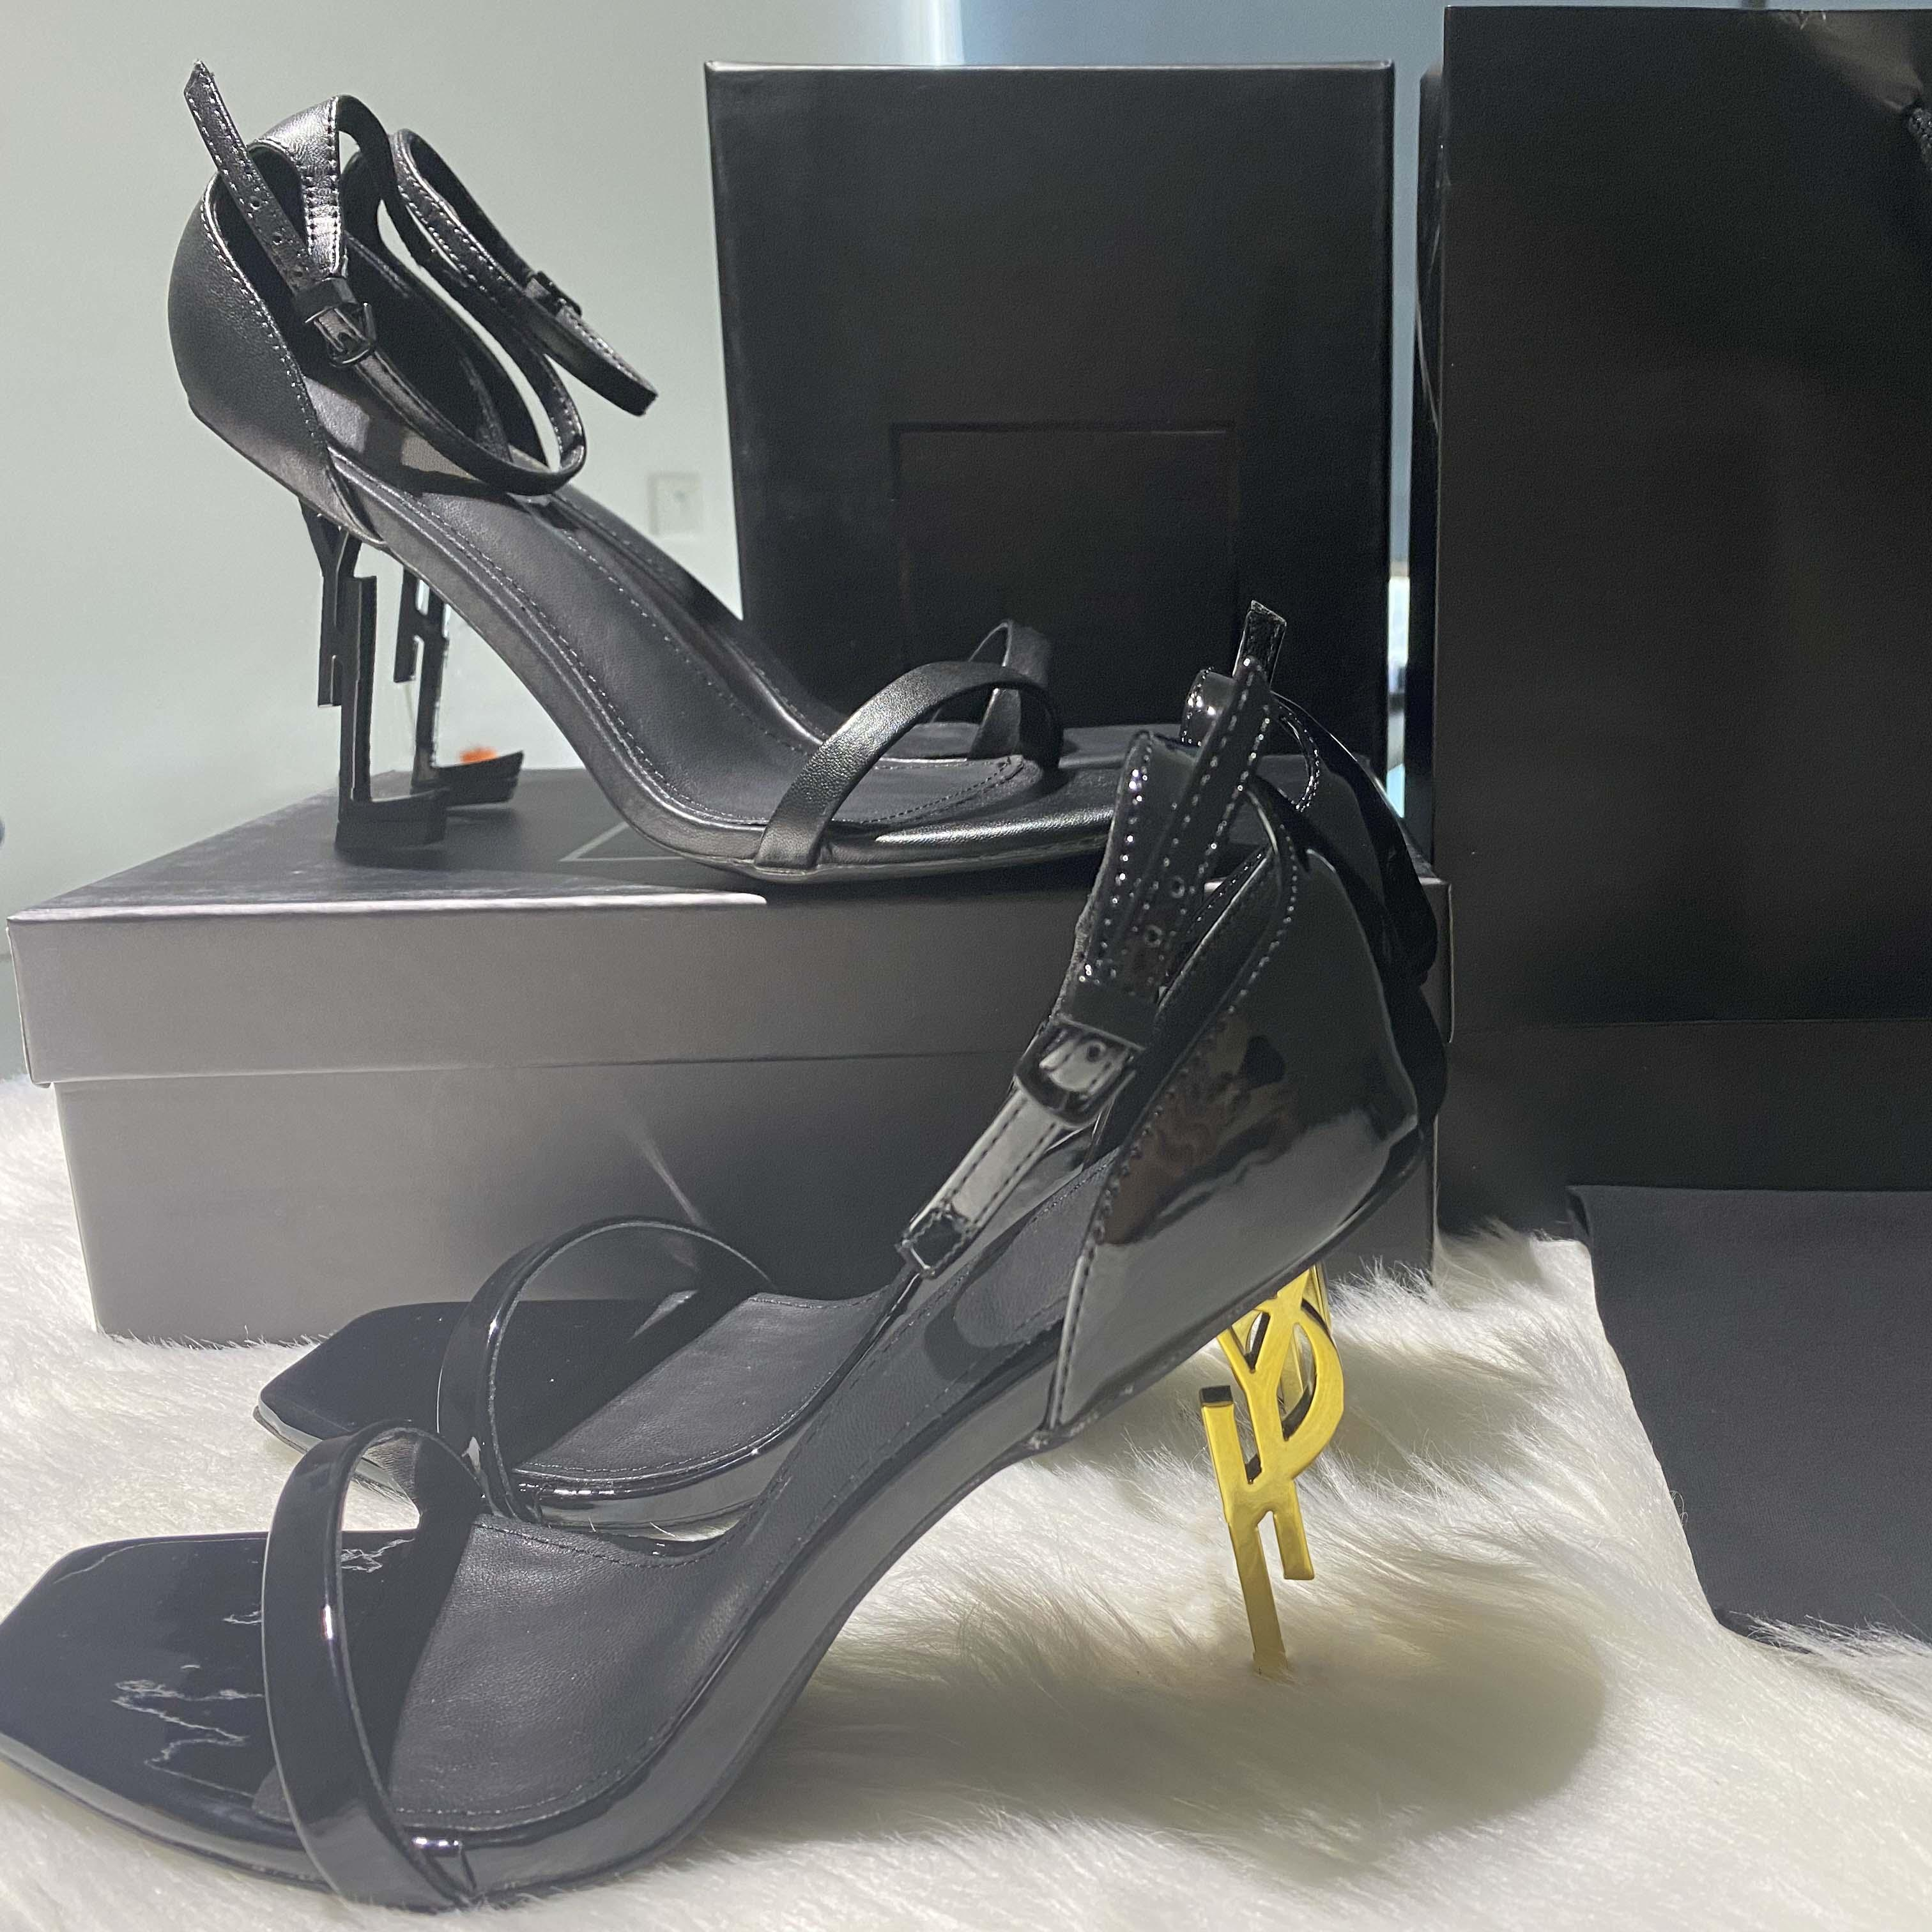 Classics Women Shoes Sandals Tacones Moda Playa Playa Grueso Inferior Vestido Zapato Alfabeto Lady Sandal Cuero Talón alto Tallón por casa 011 06